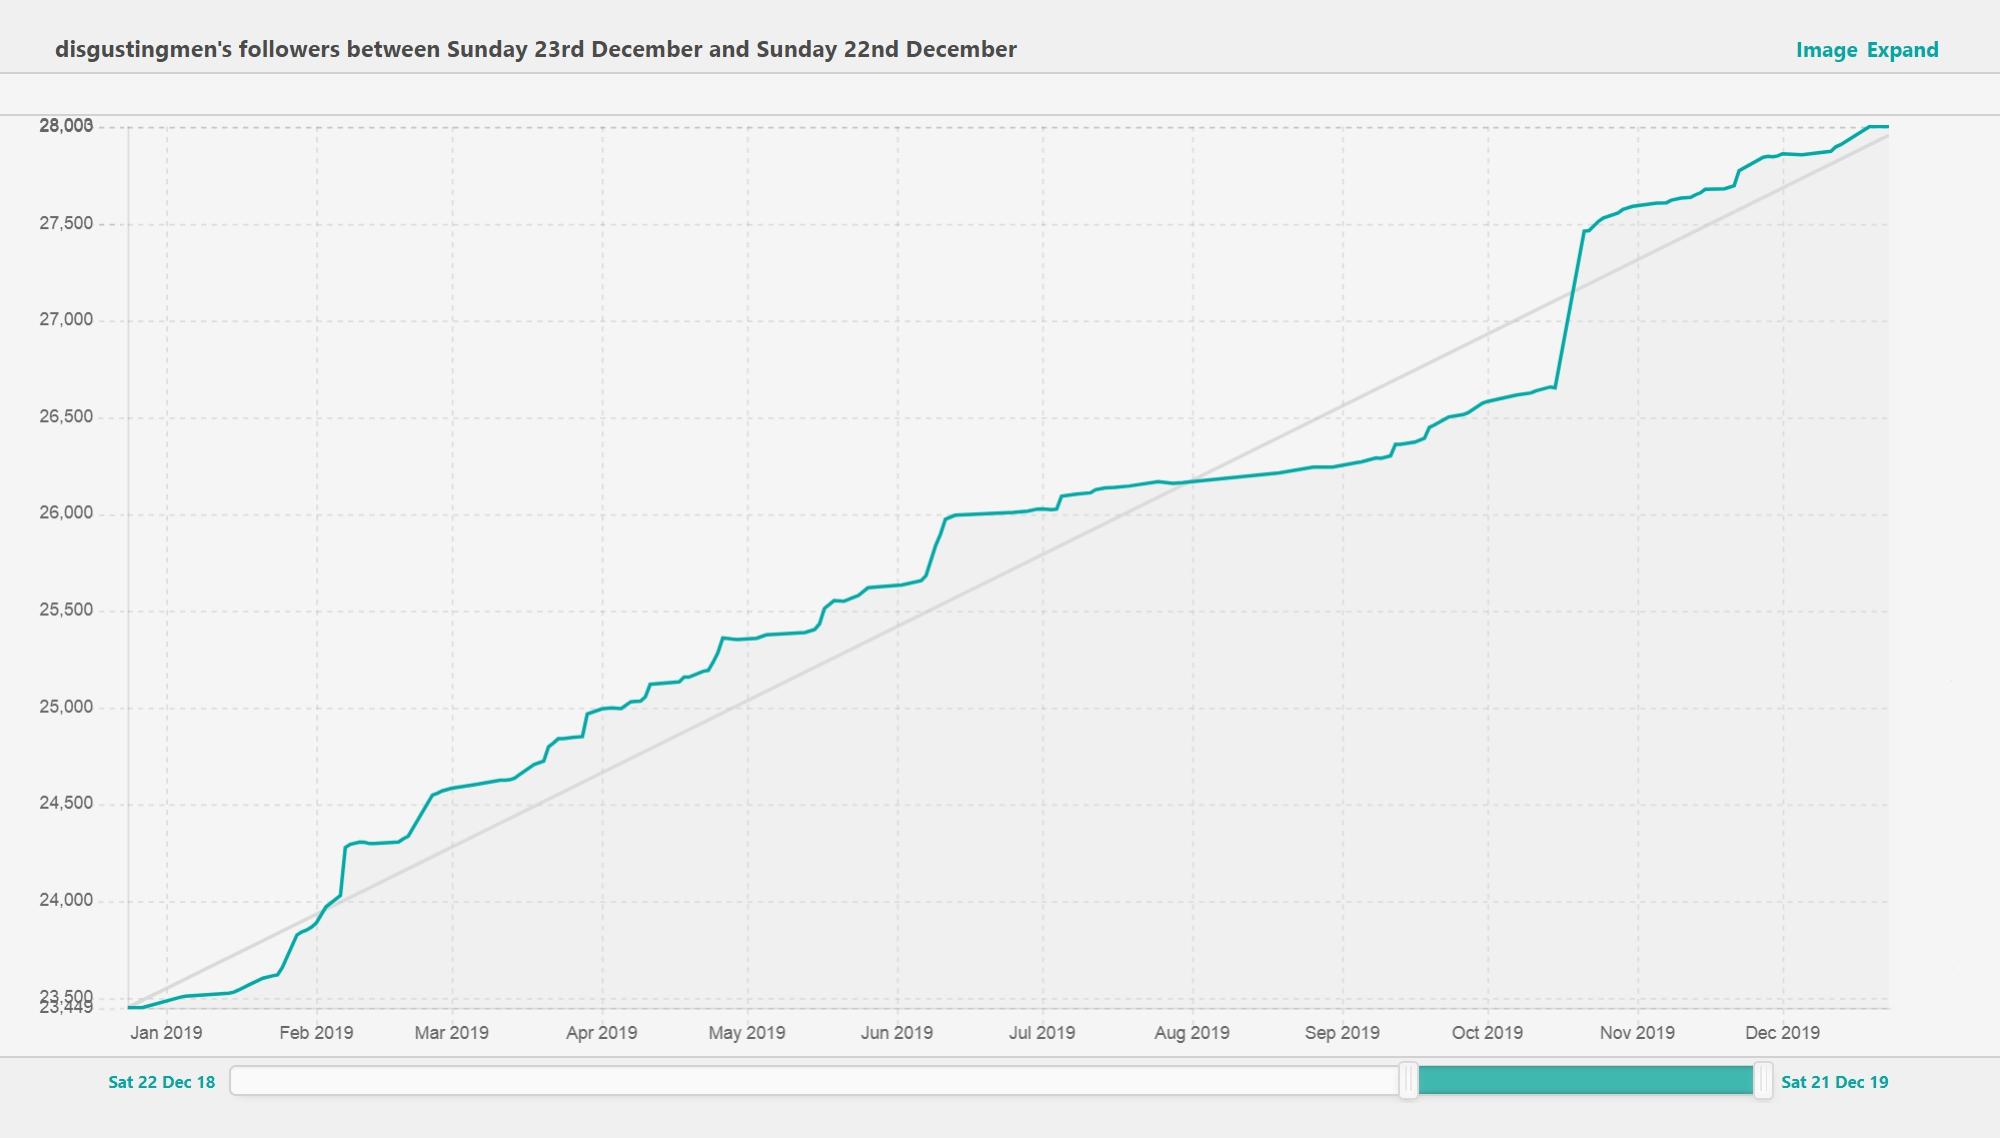 Рост аудитории канала за последний год по данным SullyGnome